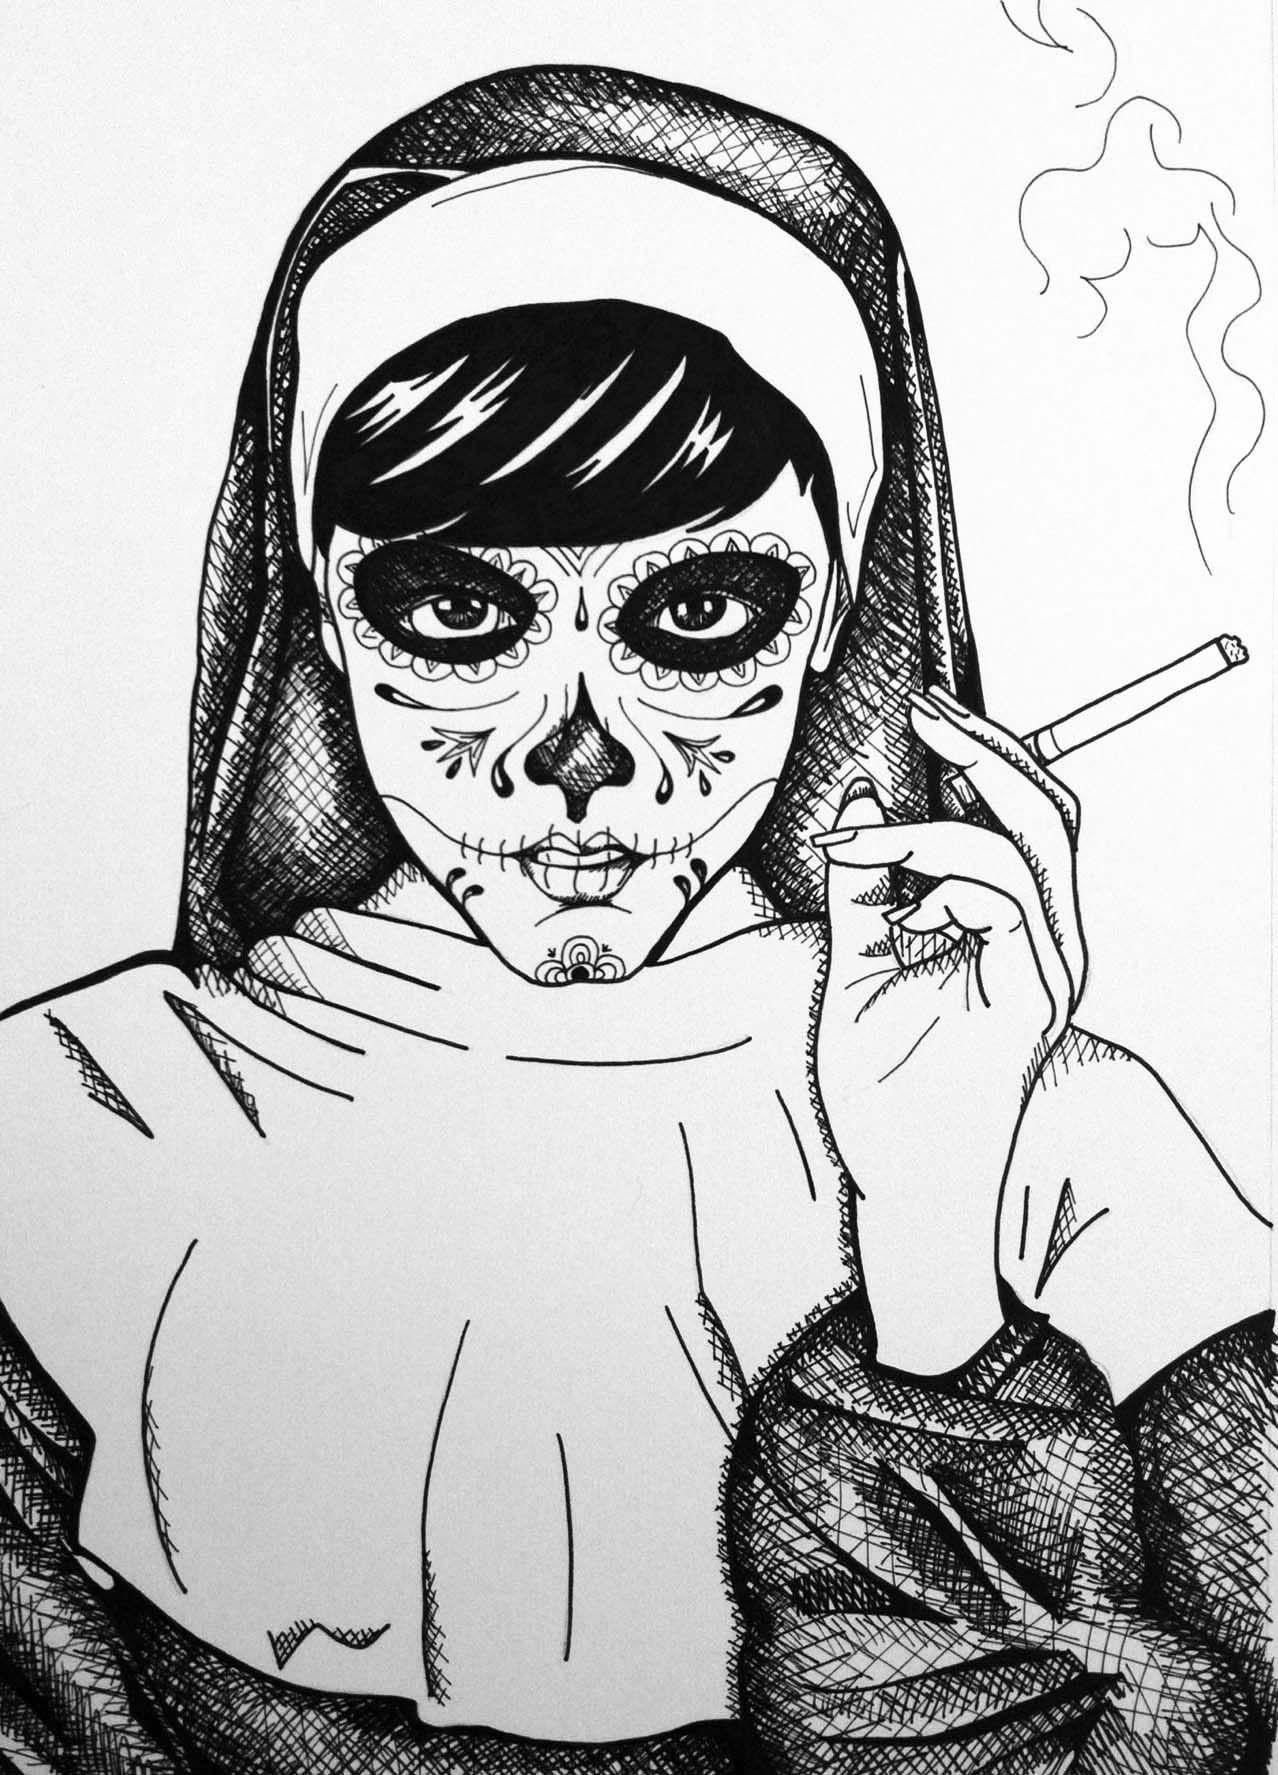 The Smoking Nun ink drawing.